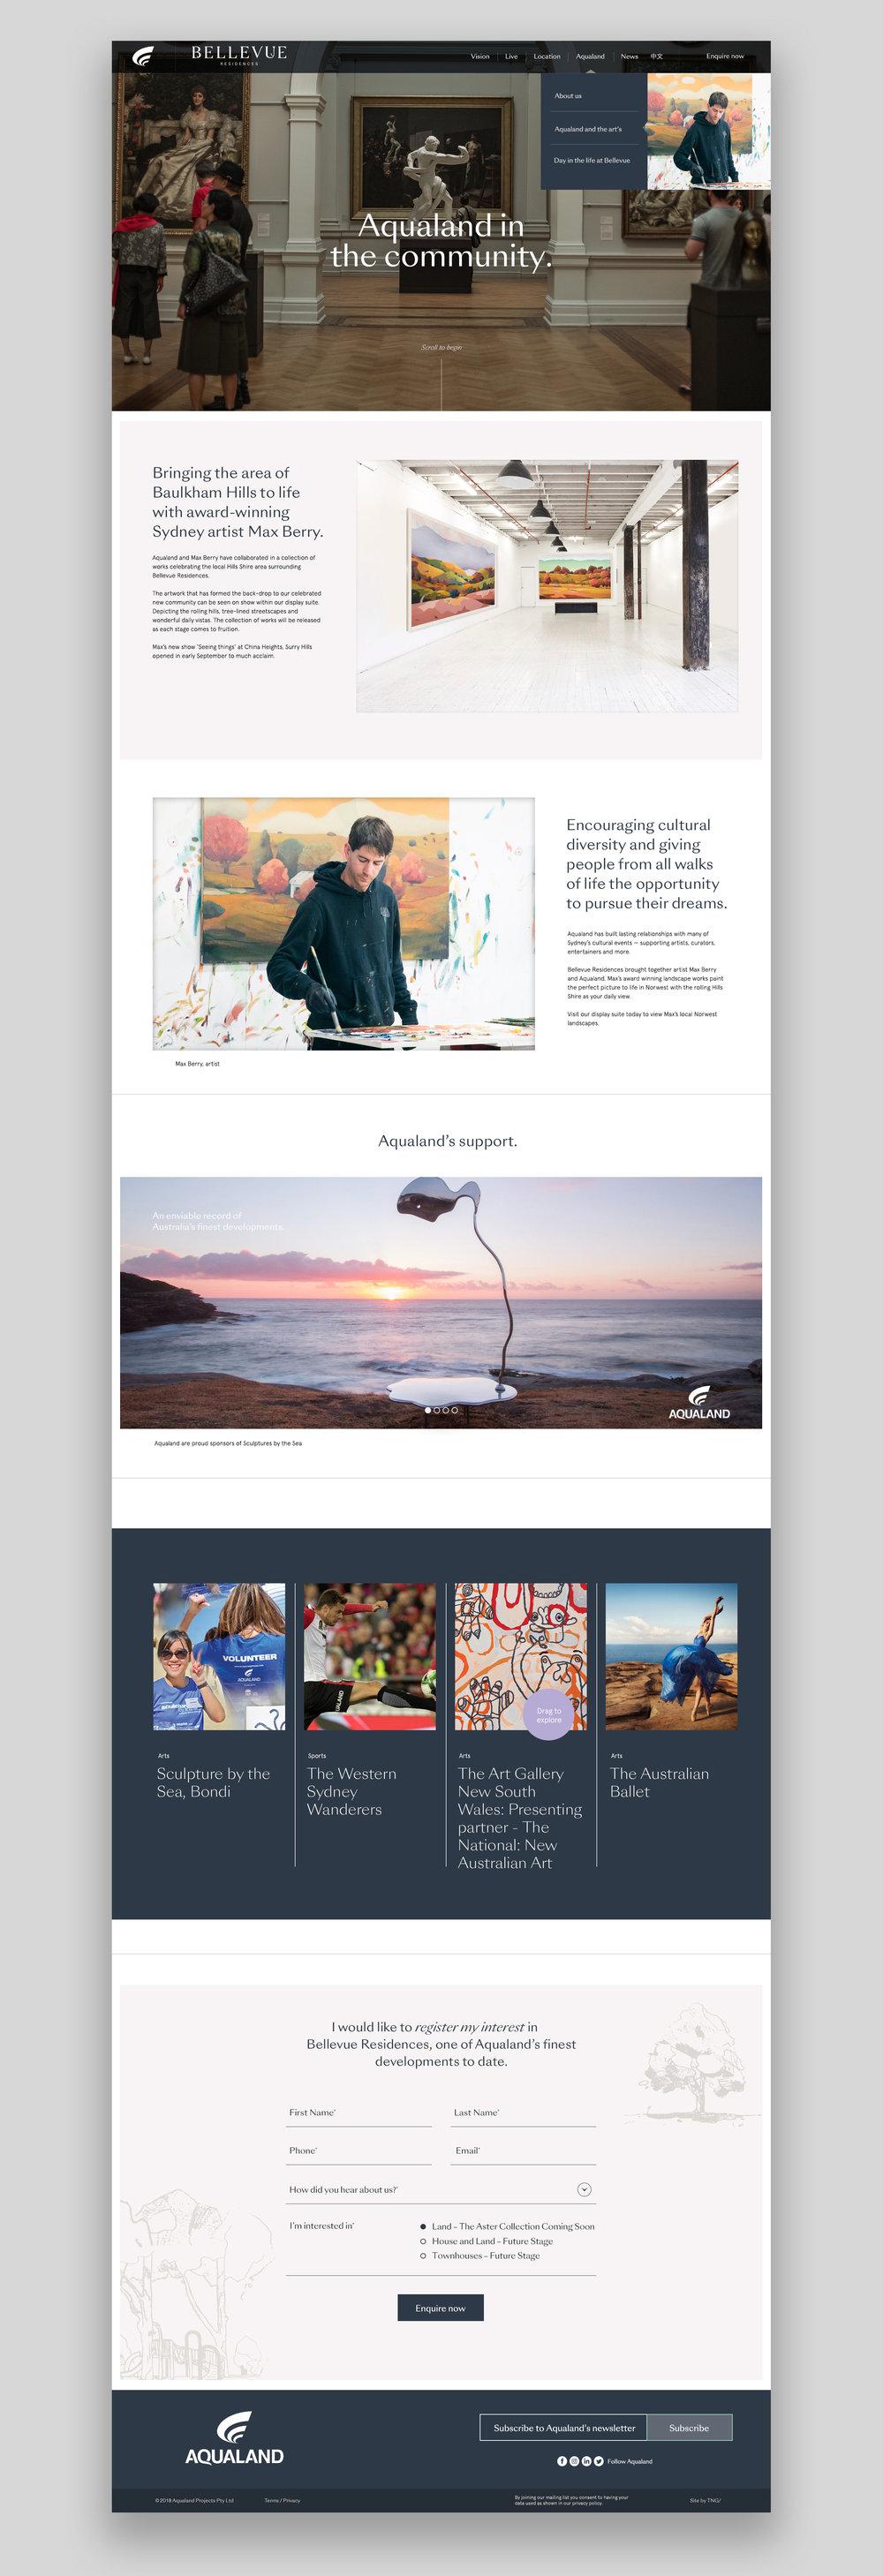 aqualand_bellevue_residences_brand_identity_property_sydney_marketing copy 8.jpg